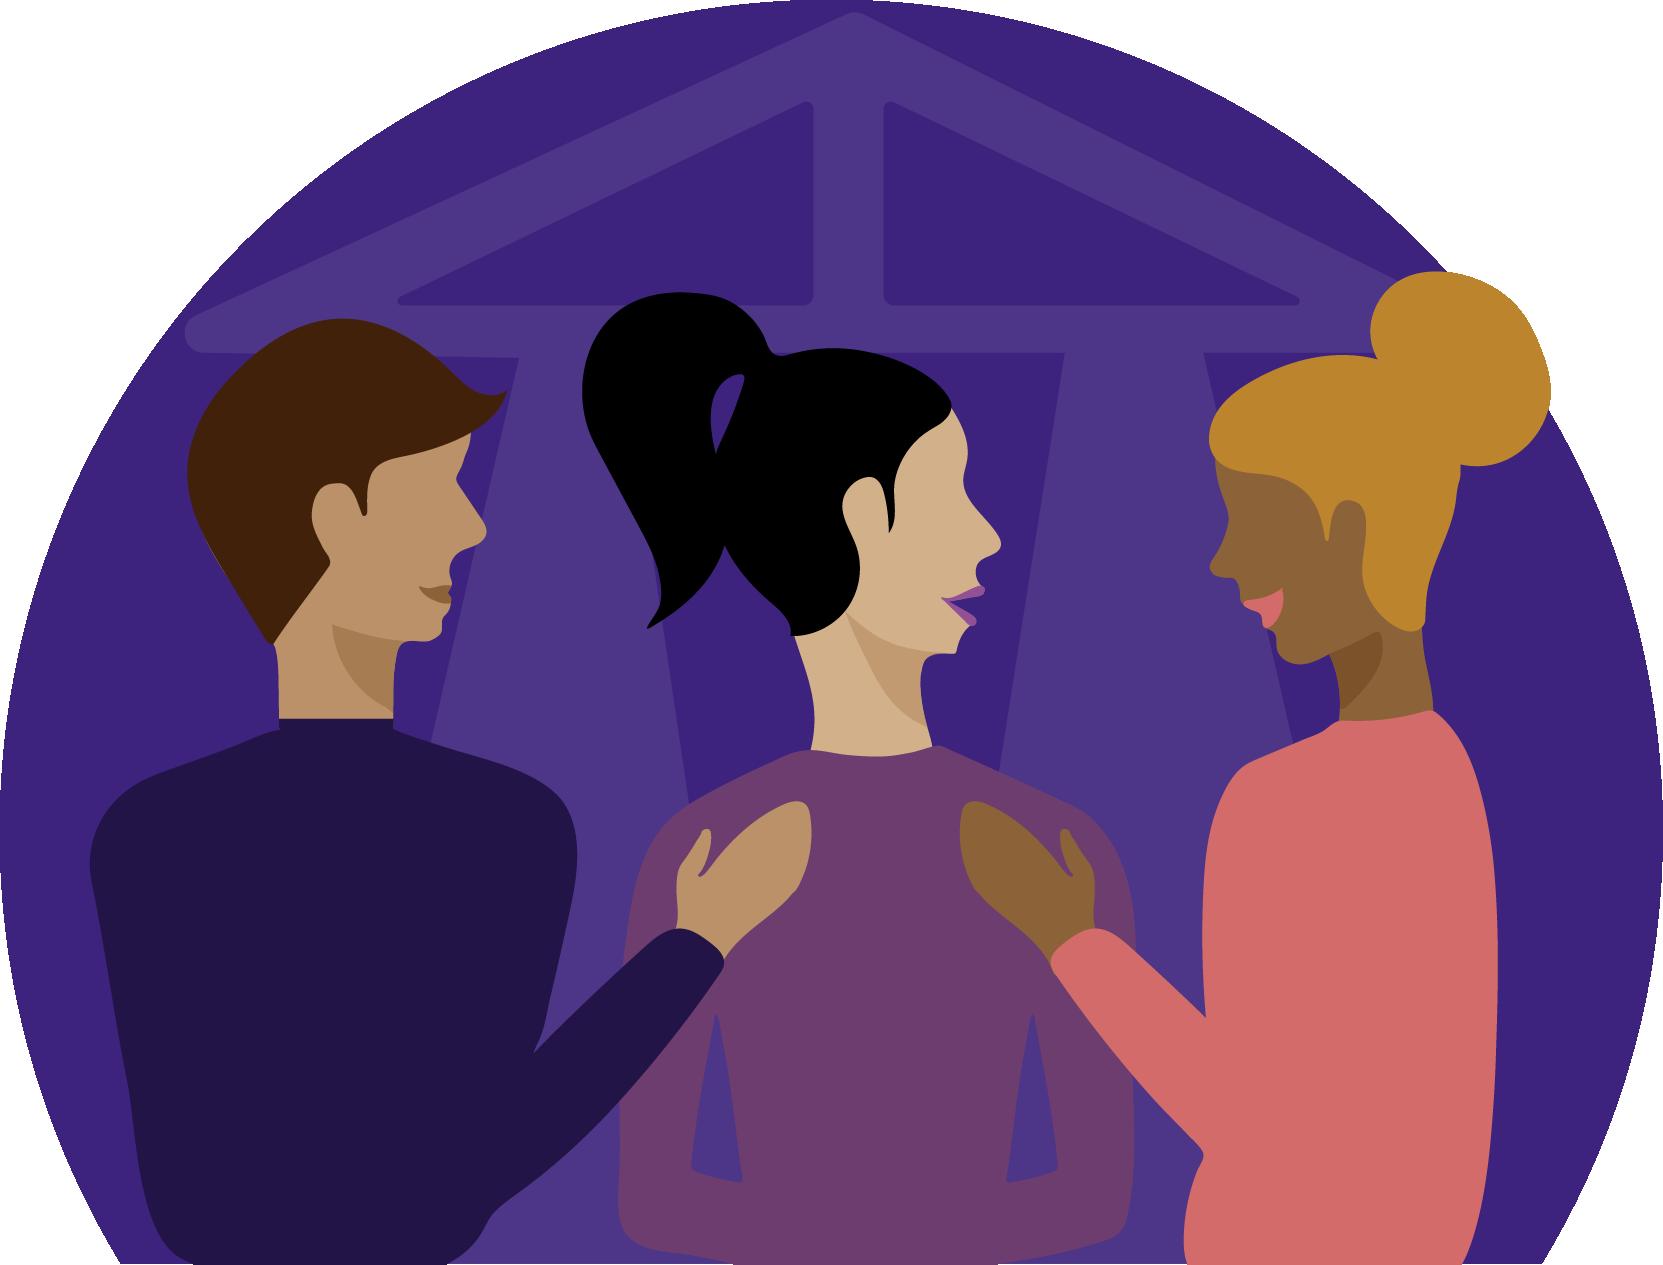 Behavioral Health Treatment Center Illustration